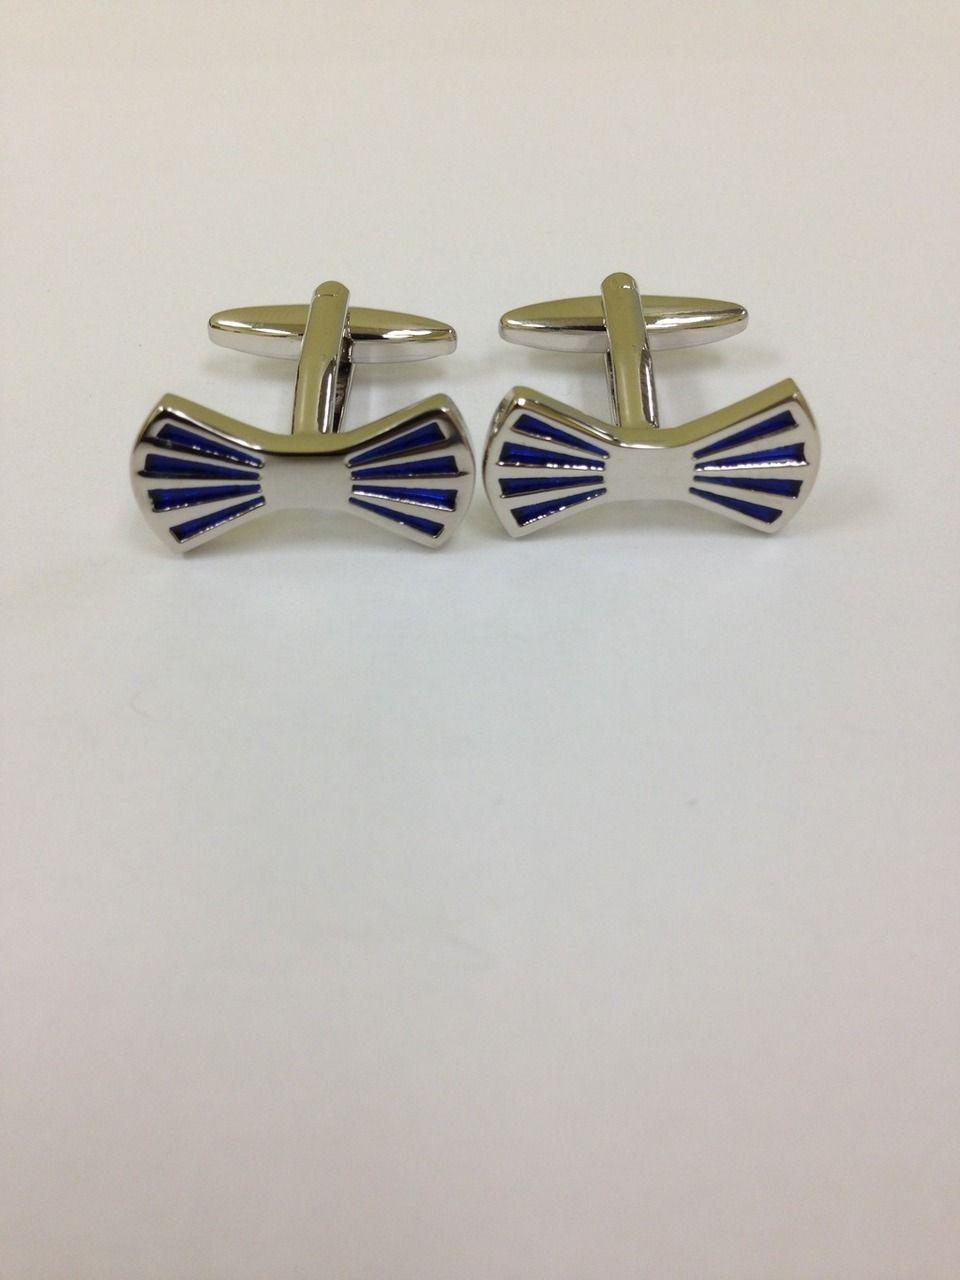 2 Pc. Blue Bow Tie Formal Fashion Design Cufflinks